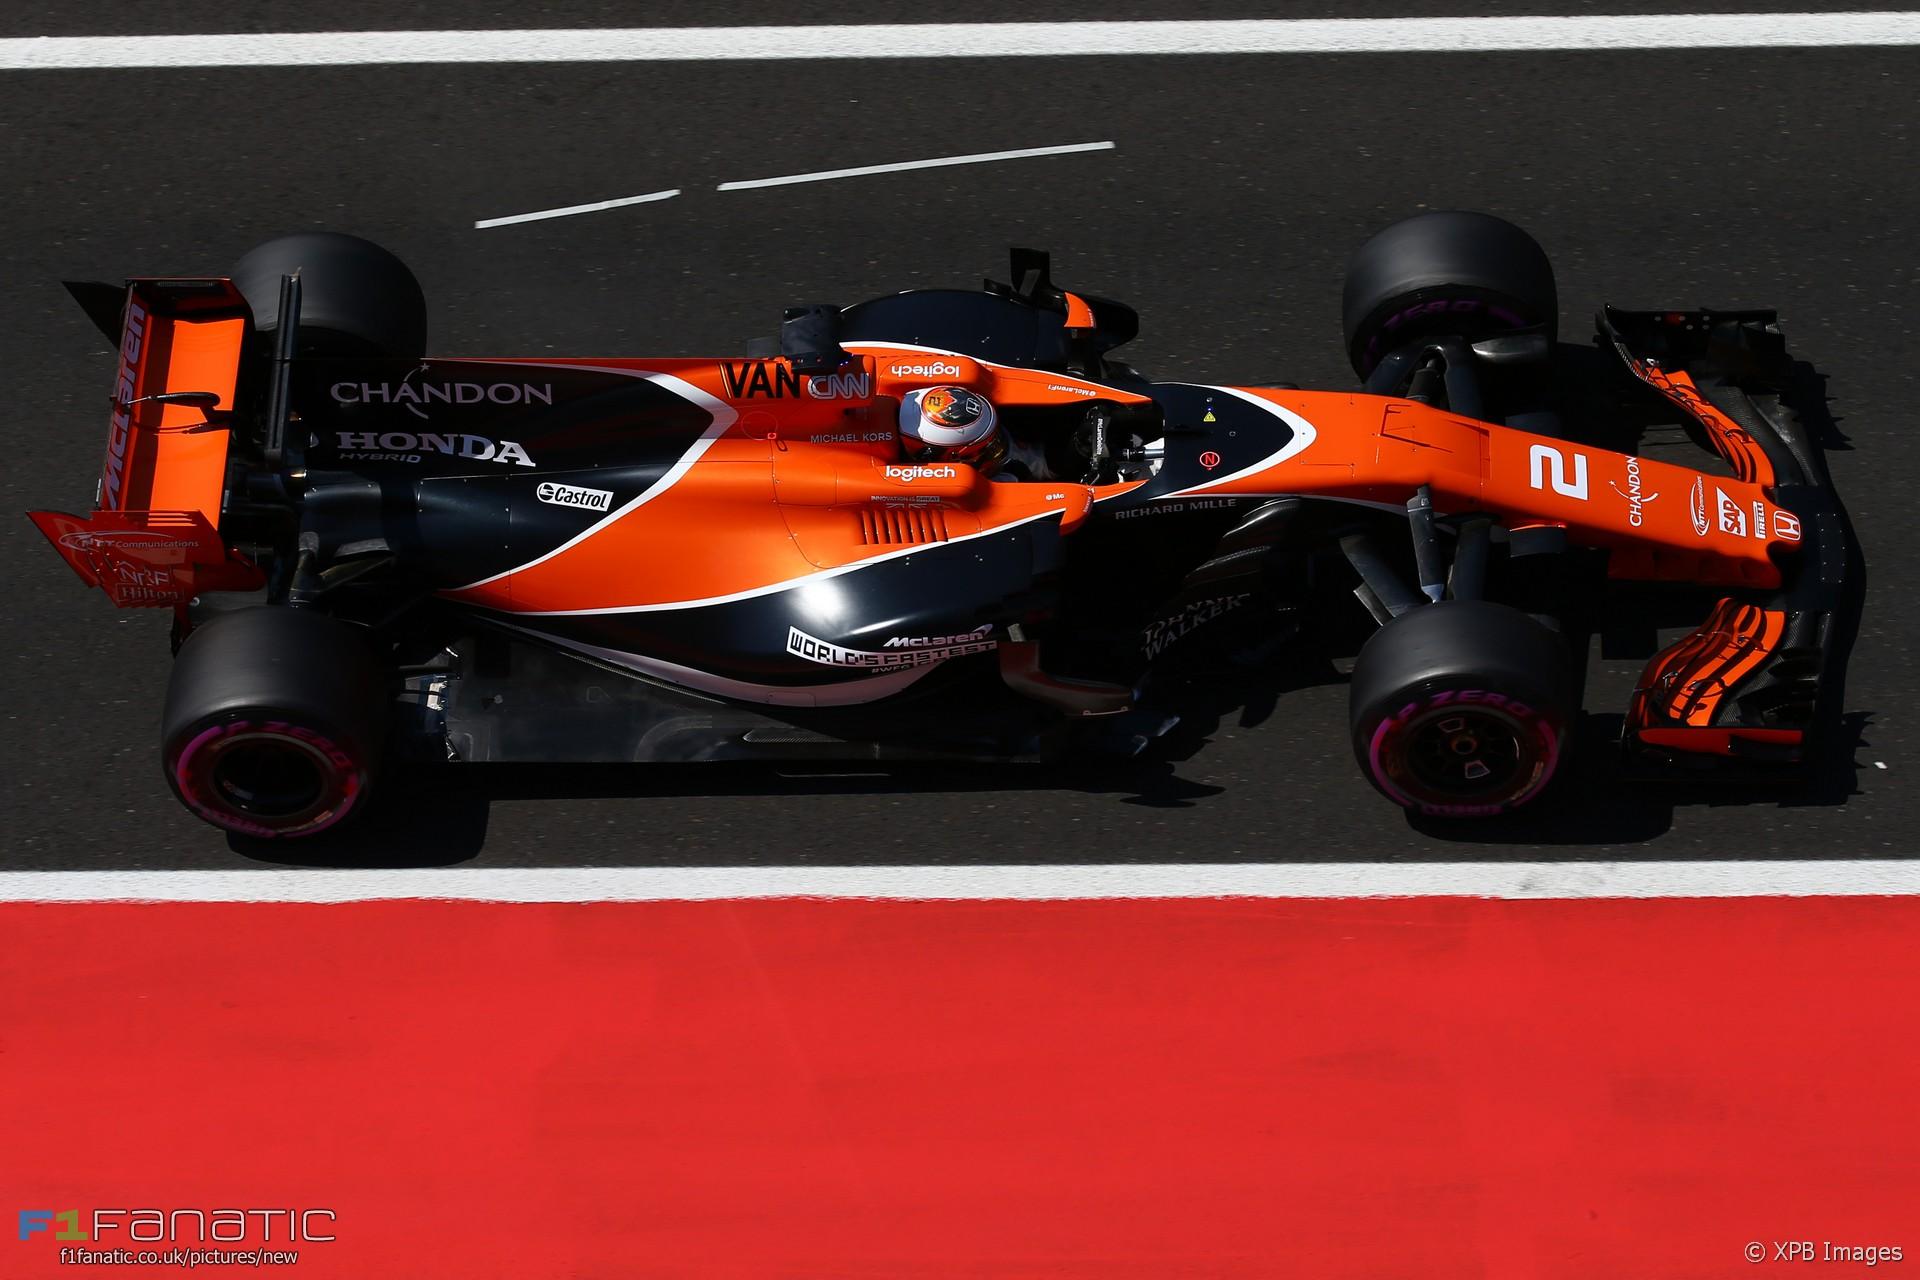 Stoffel Vandoorne Mclaren Hungaroring 2017 F1 Fanatic